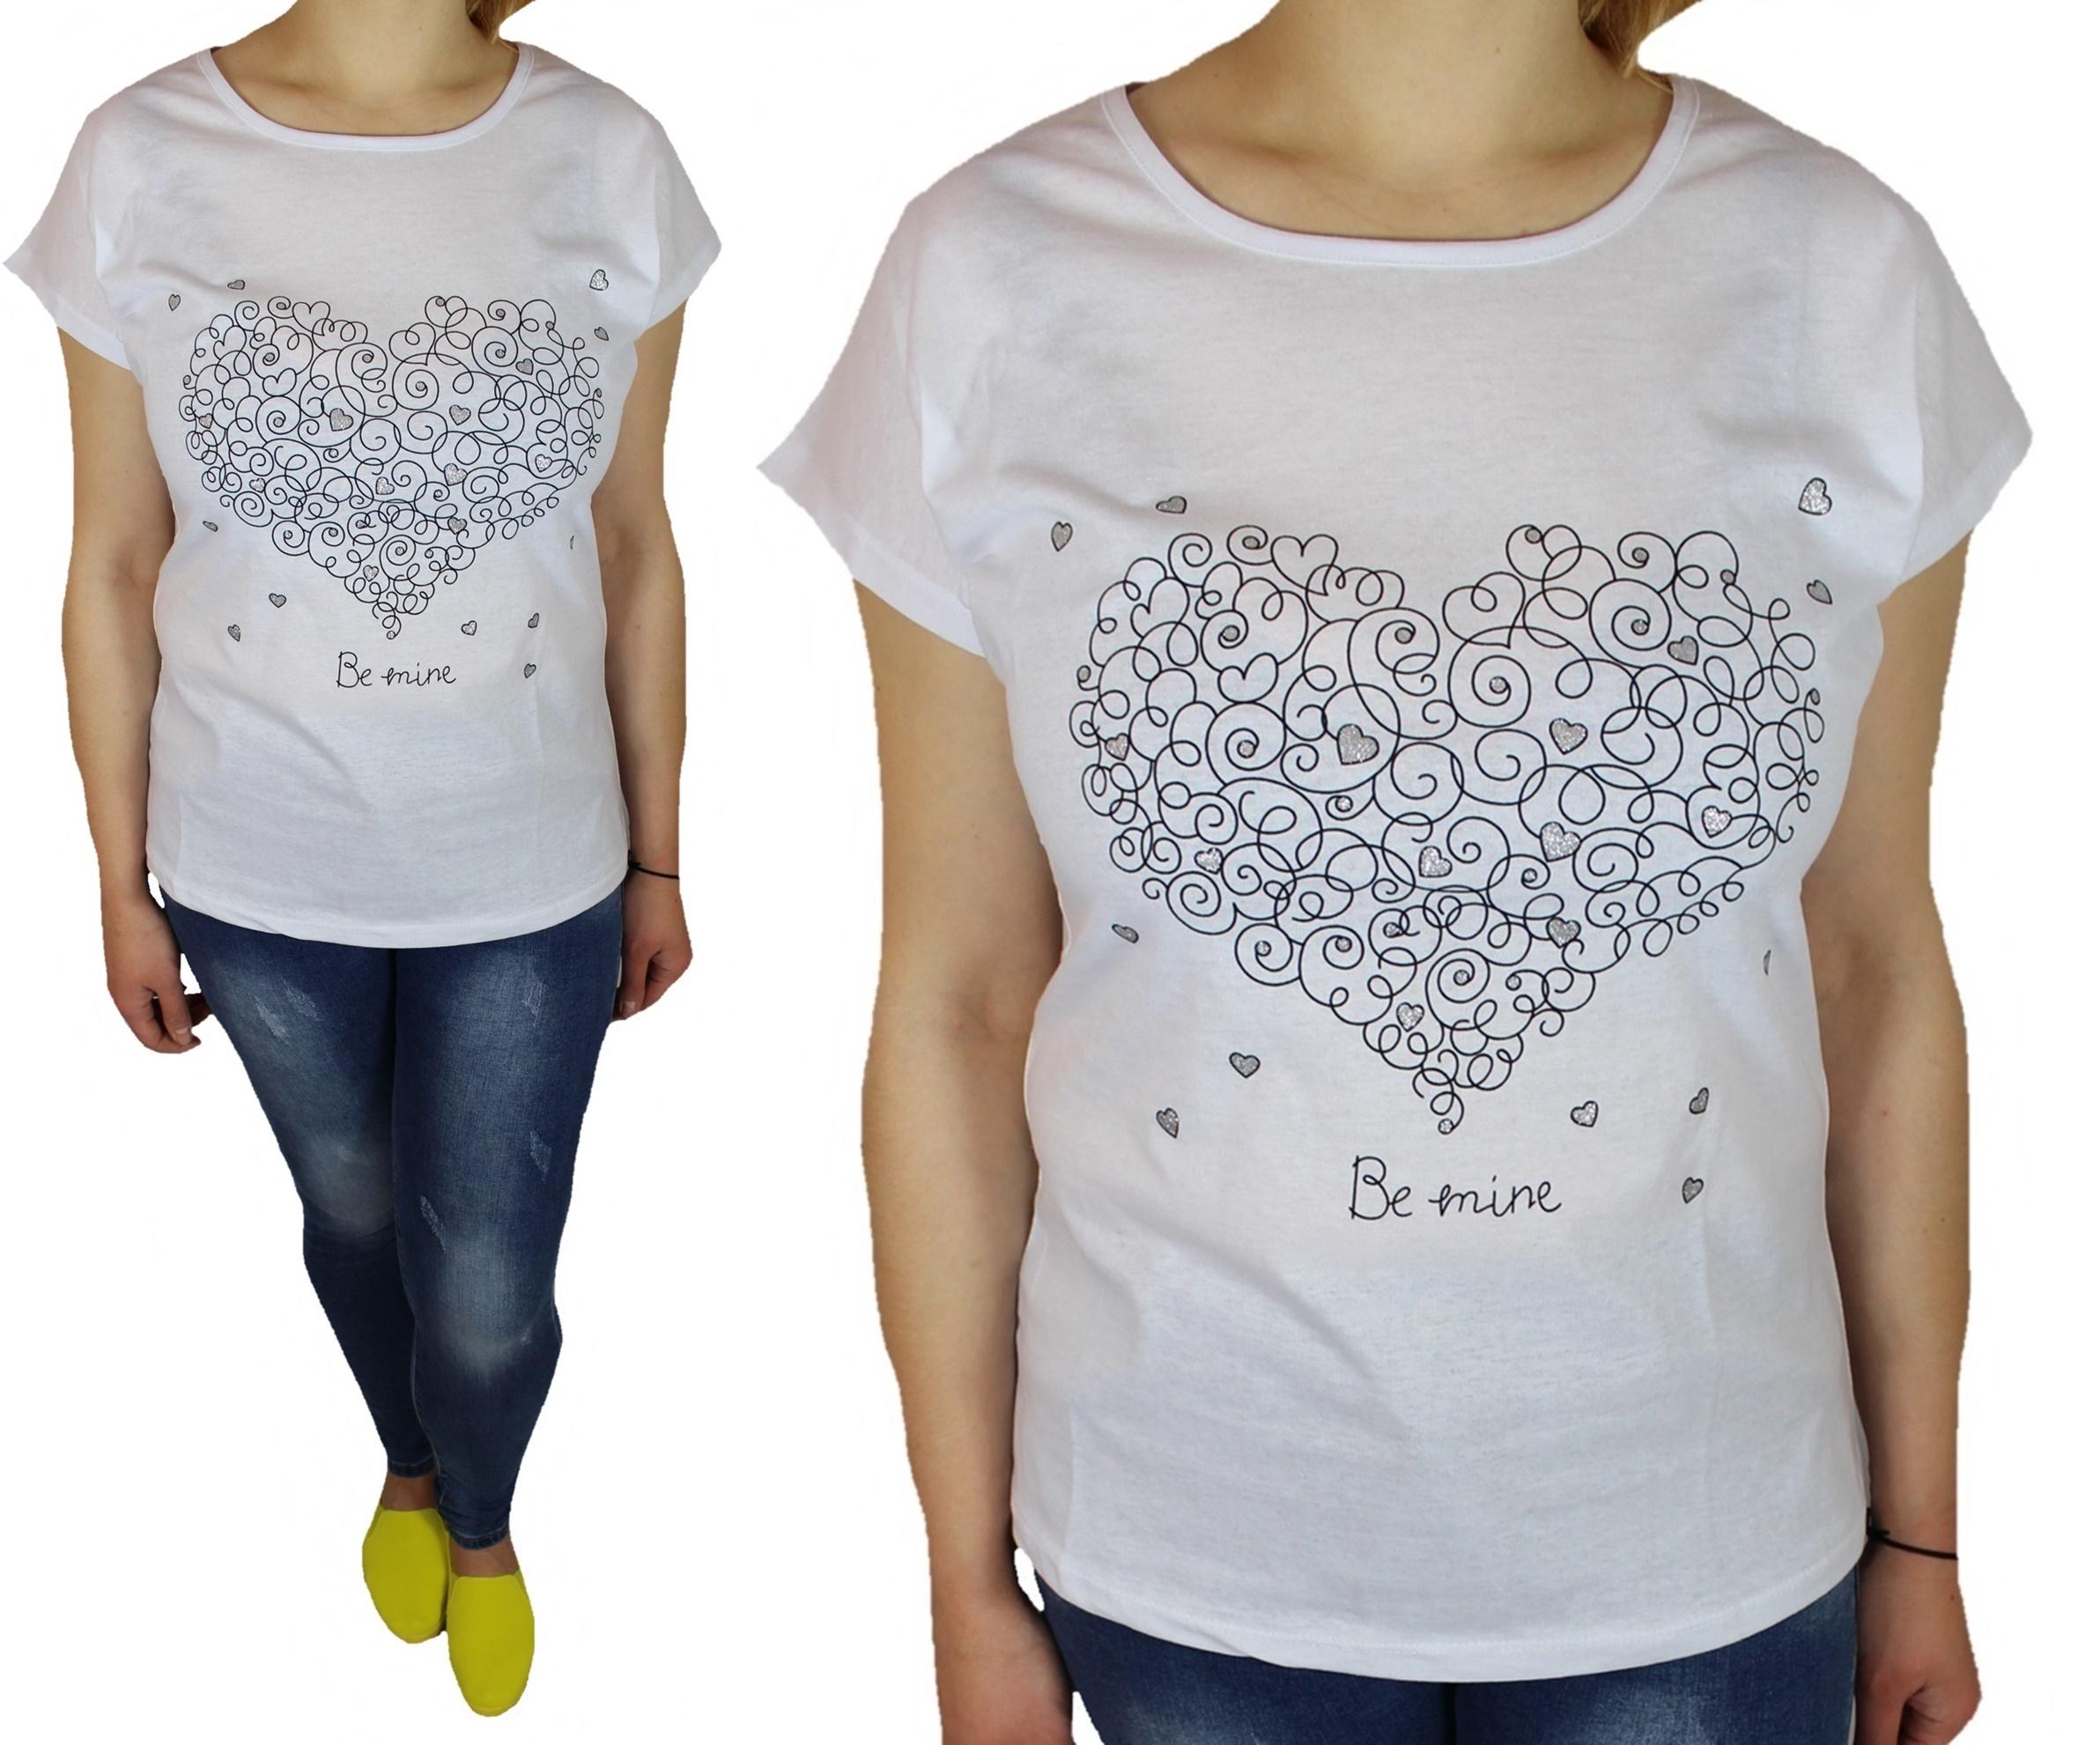 095ba1c1a86c1 Bawełniane bluzki t-shirty damskie wzór SERCE 2XL - 7296548064 ...